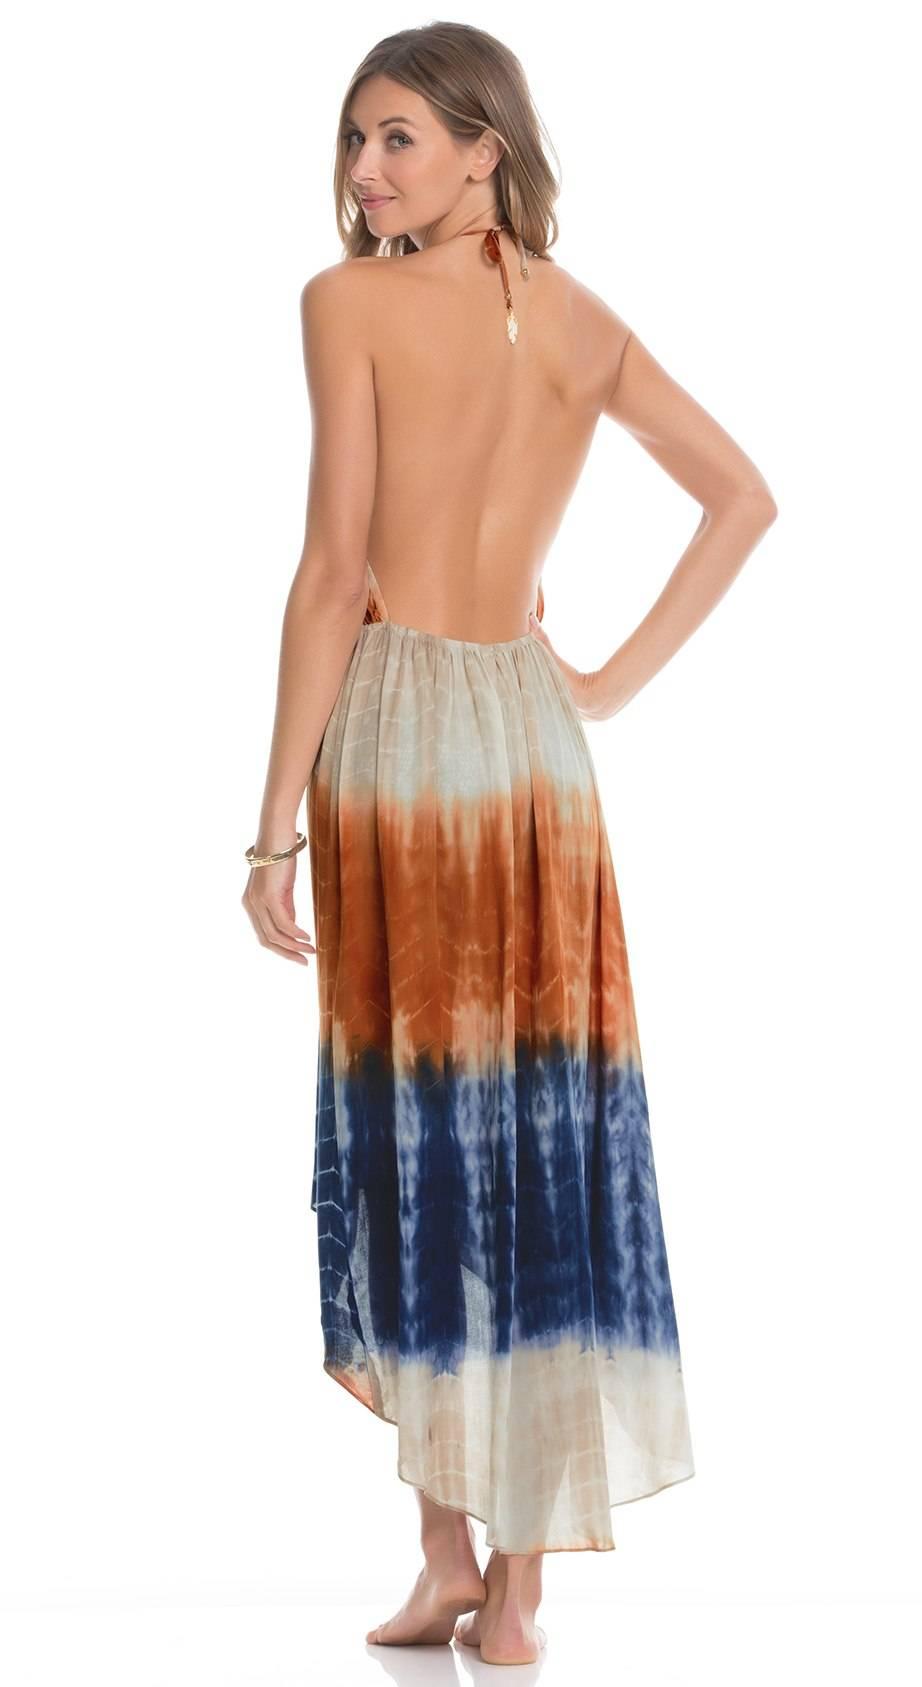 BOA FORMA_Dress_2BACK_1200x1800